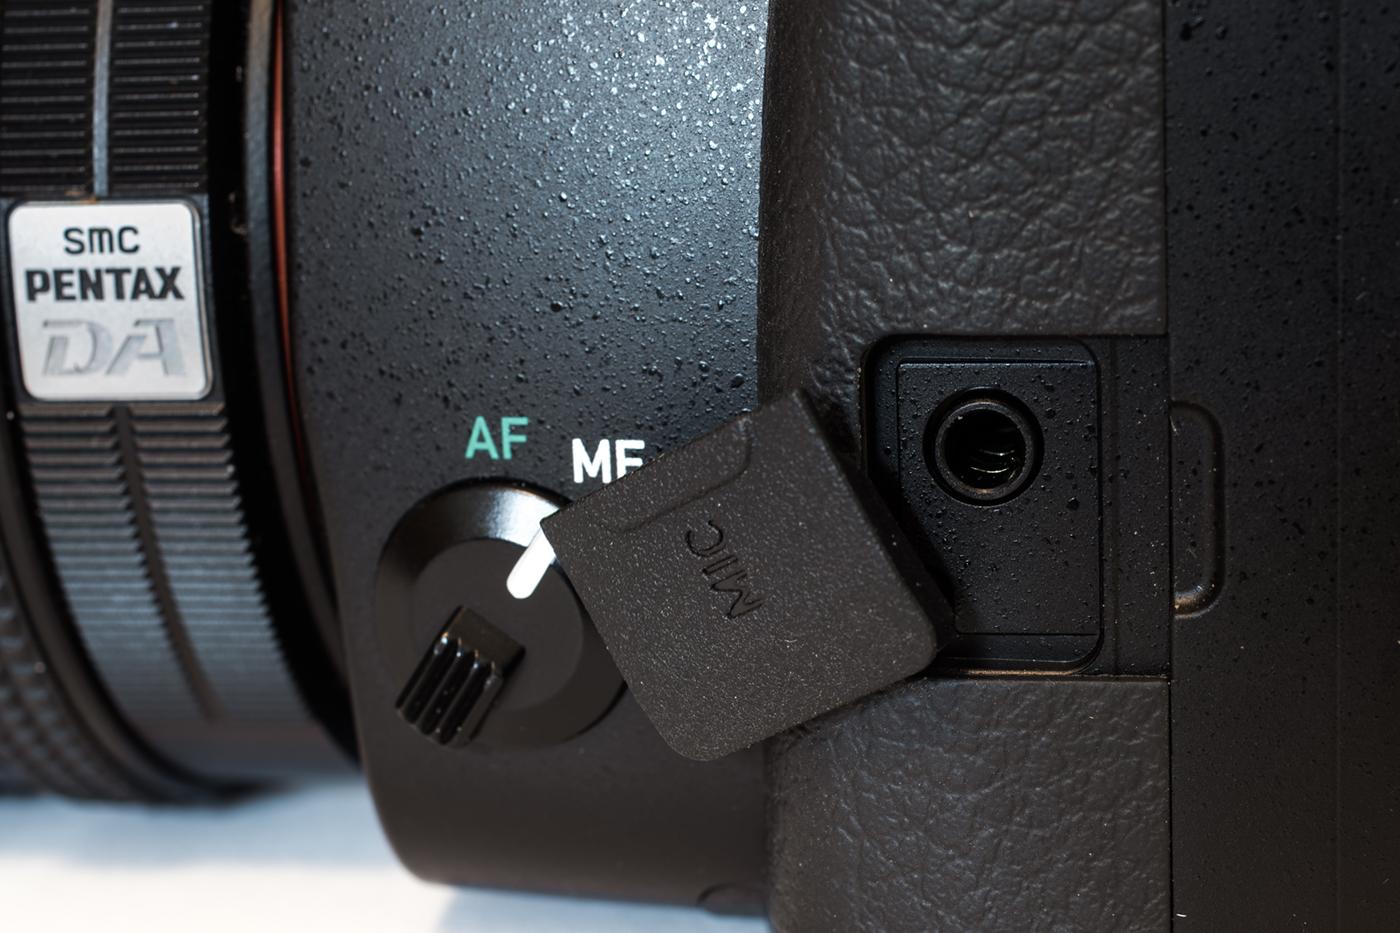 The external mic port